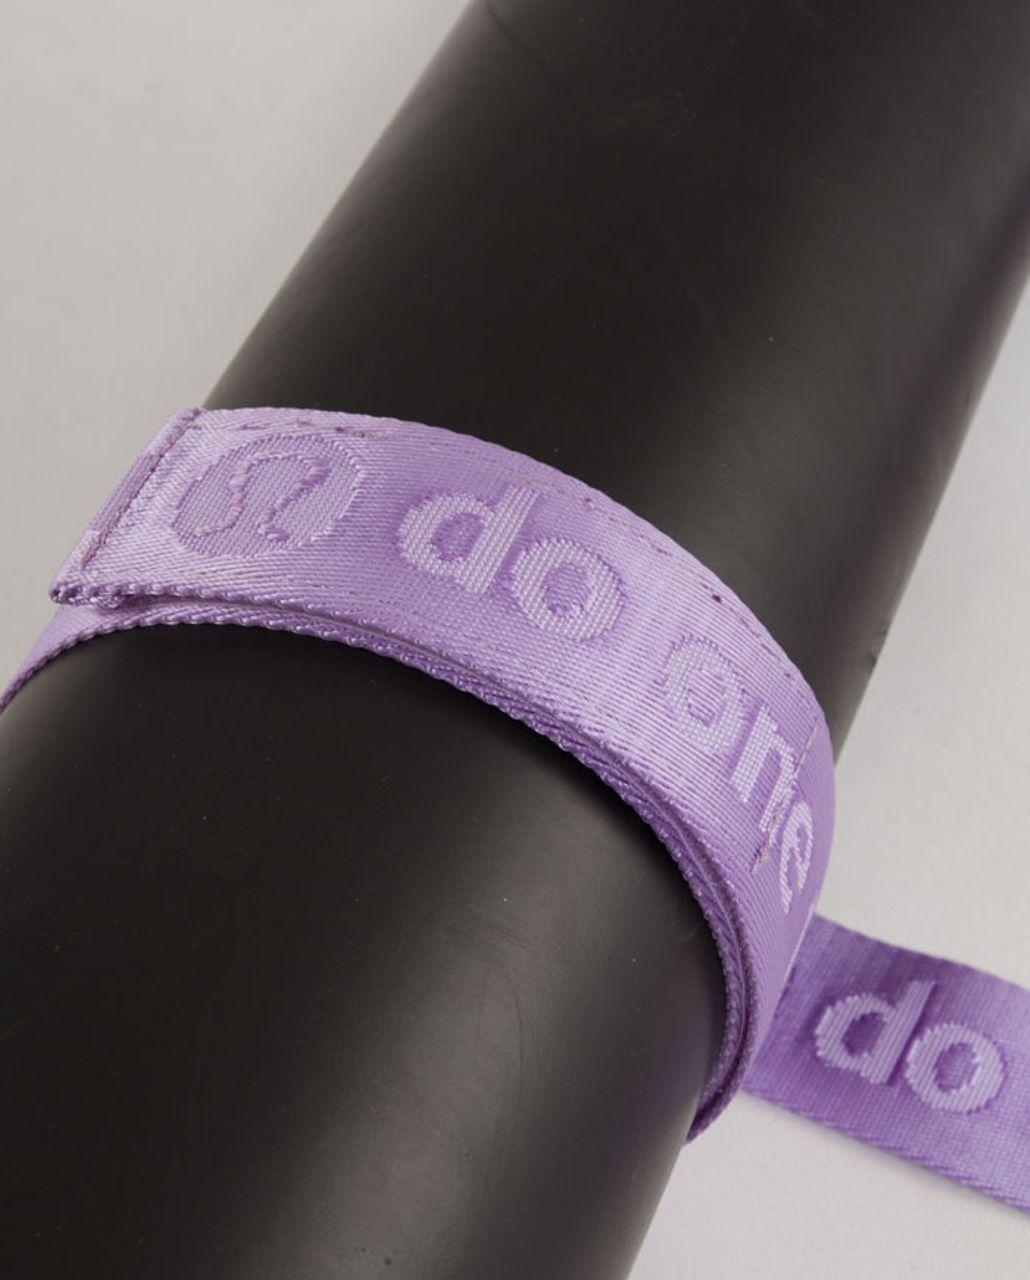 Lululemon No-Brainer Mat Strap - Lilac